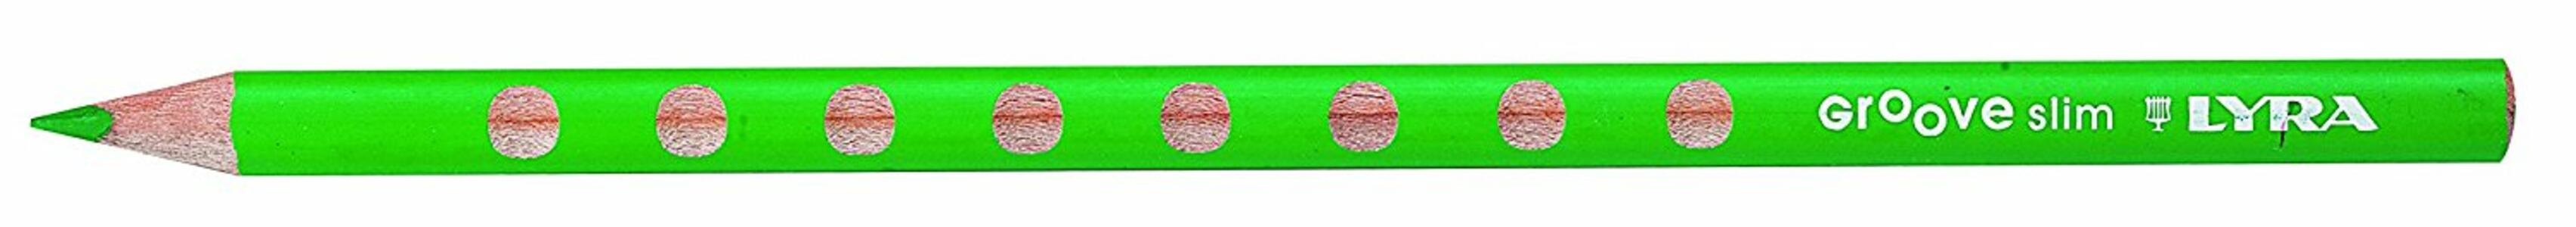 Pastelli Lyra Groove Slim. Scatola 12 matite colorate assortite + temperino - 7